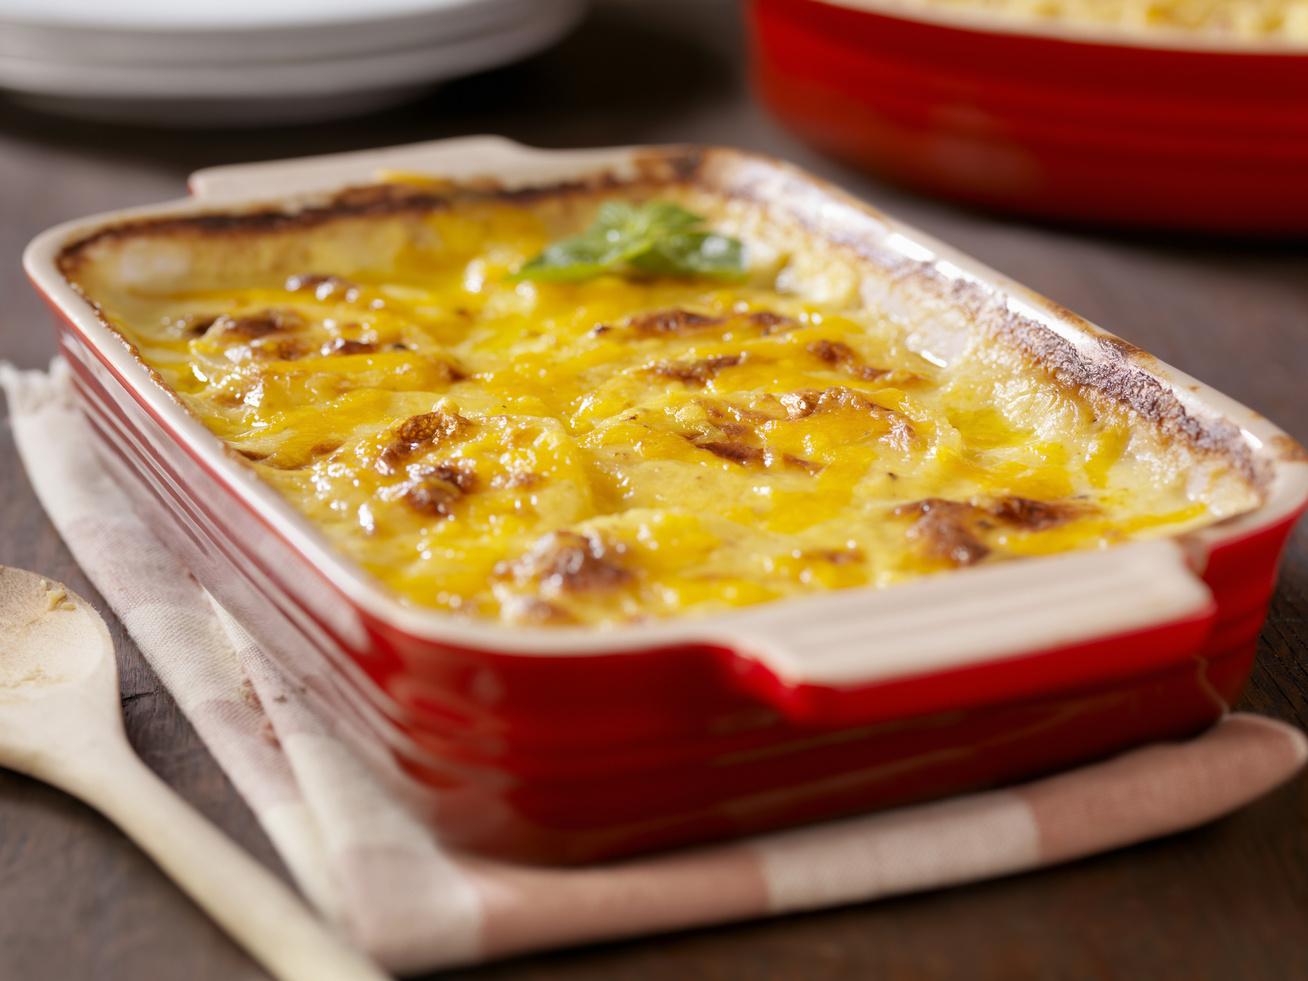 zoldeseges-tepsis-krumpli